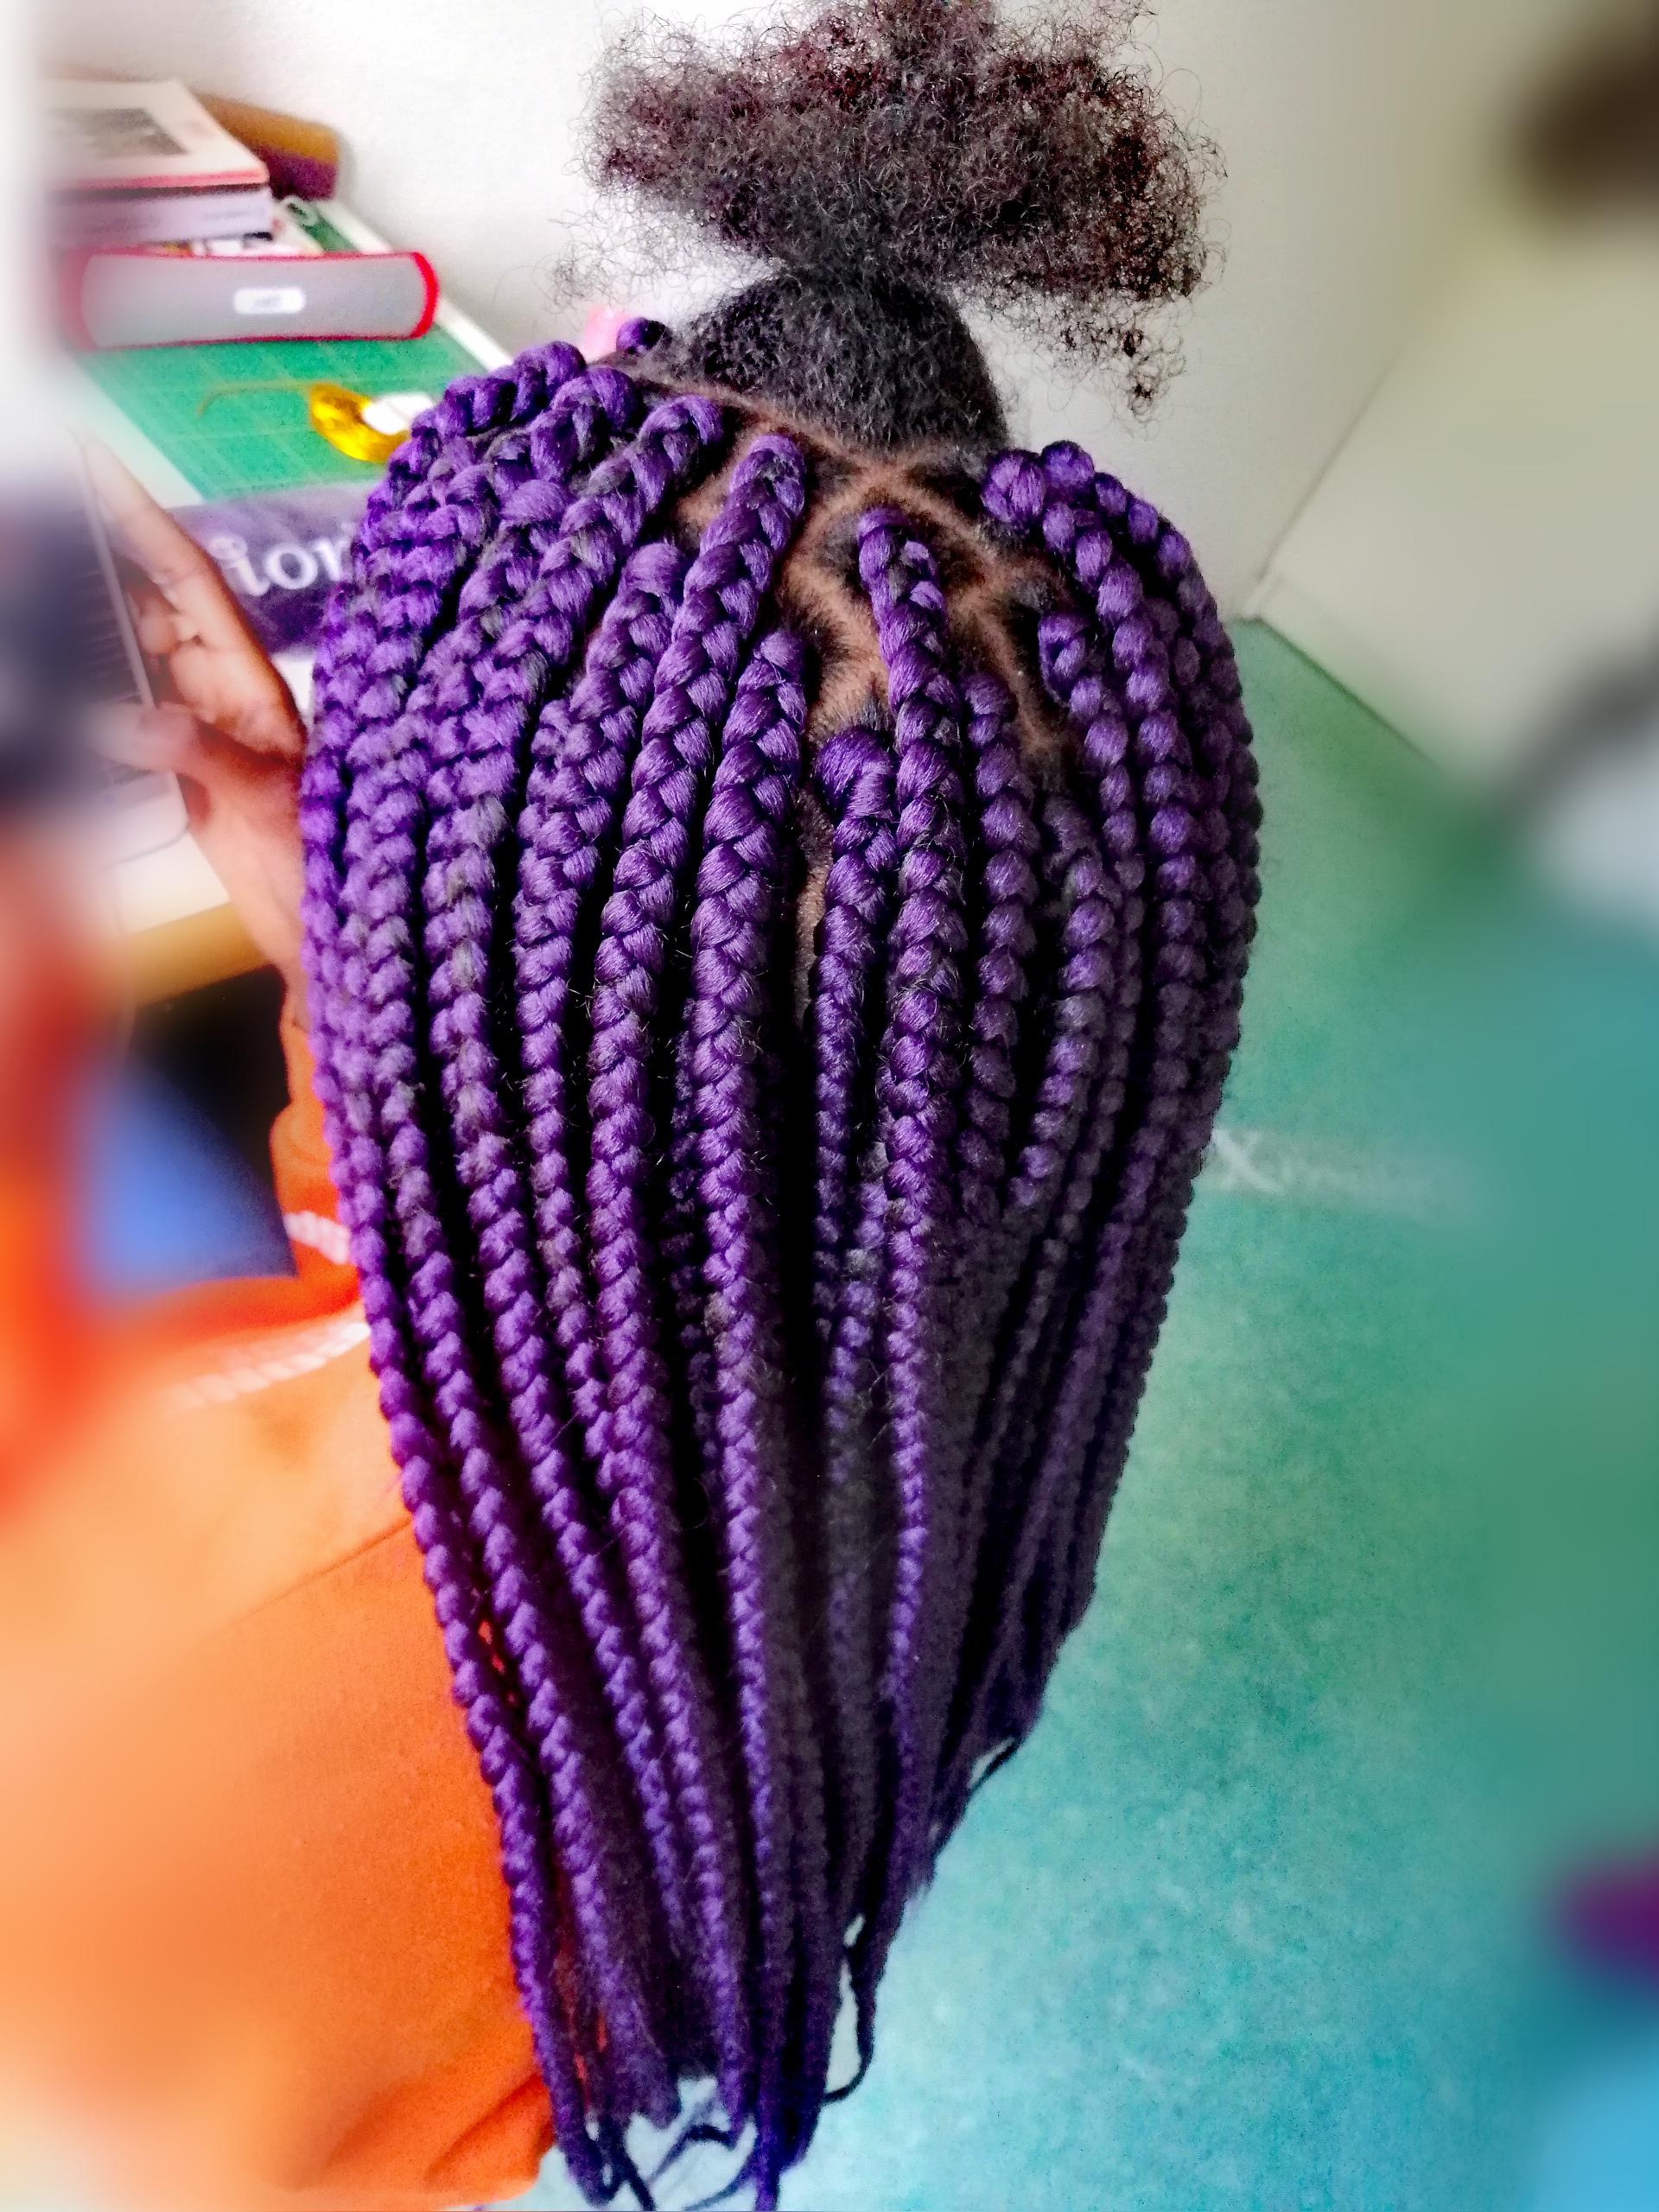 salon de coiffure afro tresse tresses box braids crochet braids vanilles tissages paris 75 77 78 91 92 93 94 95 JTKFSZPP